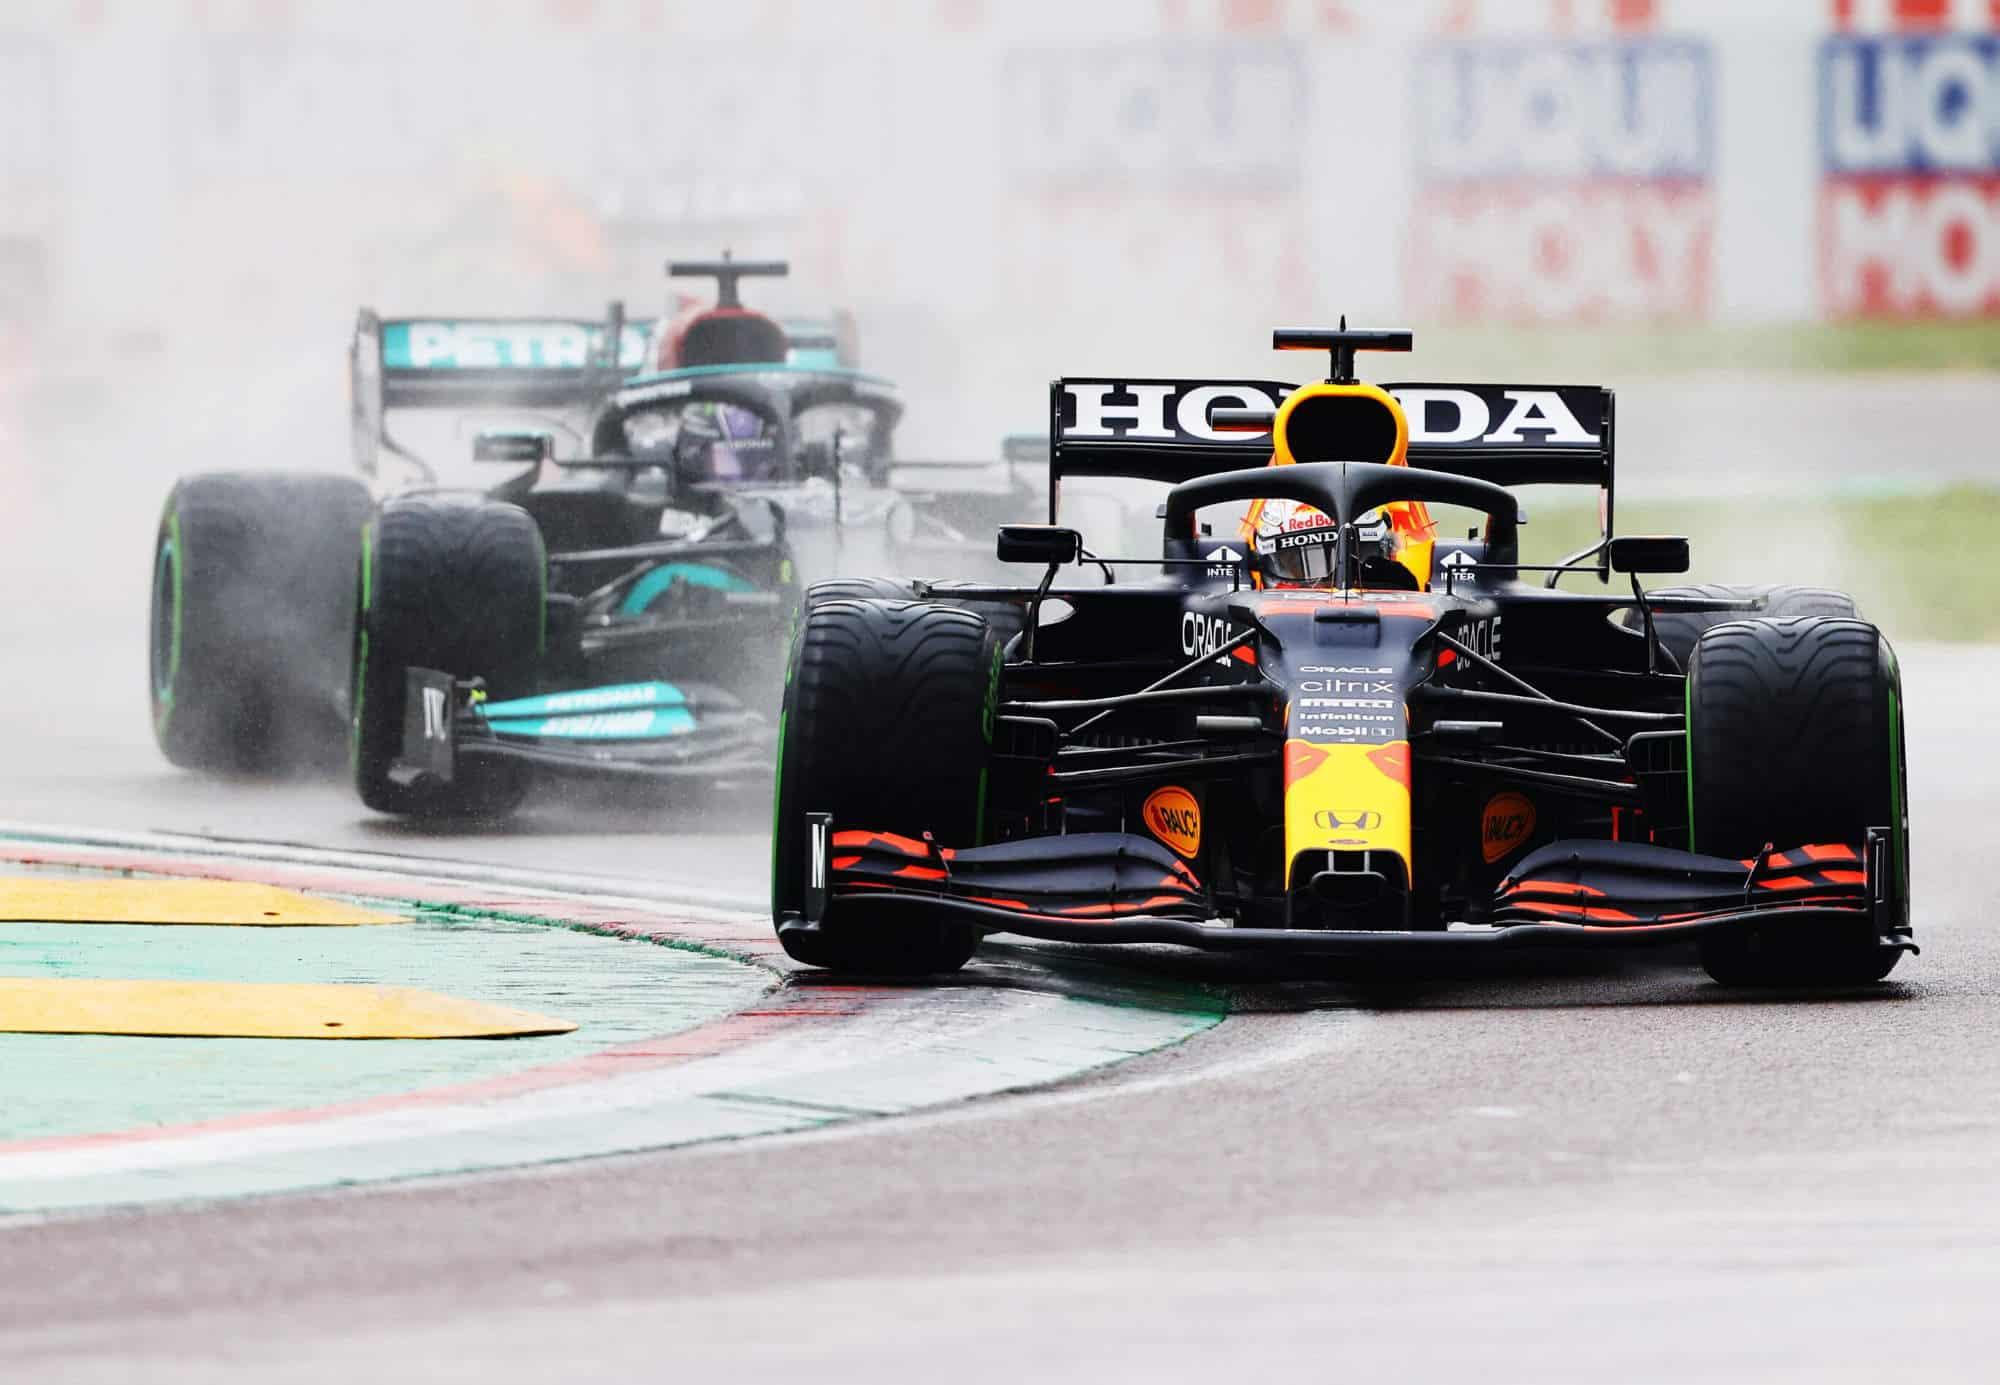 2021 Emilia Romagna GP Verstappen vs Hamilton first lap battle 2 Photo Red Bull